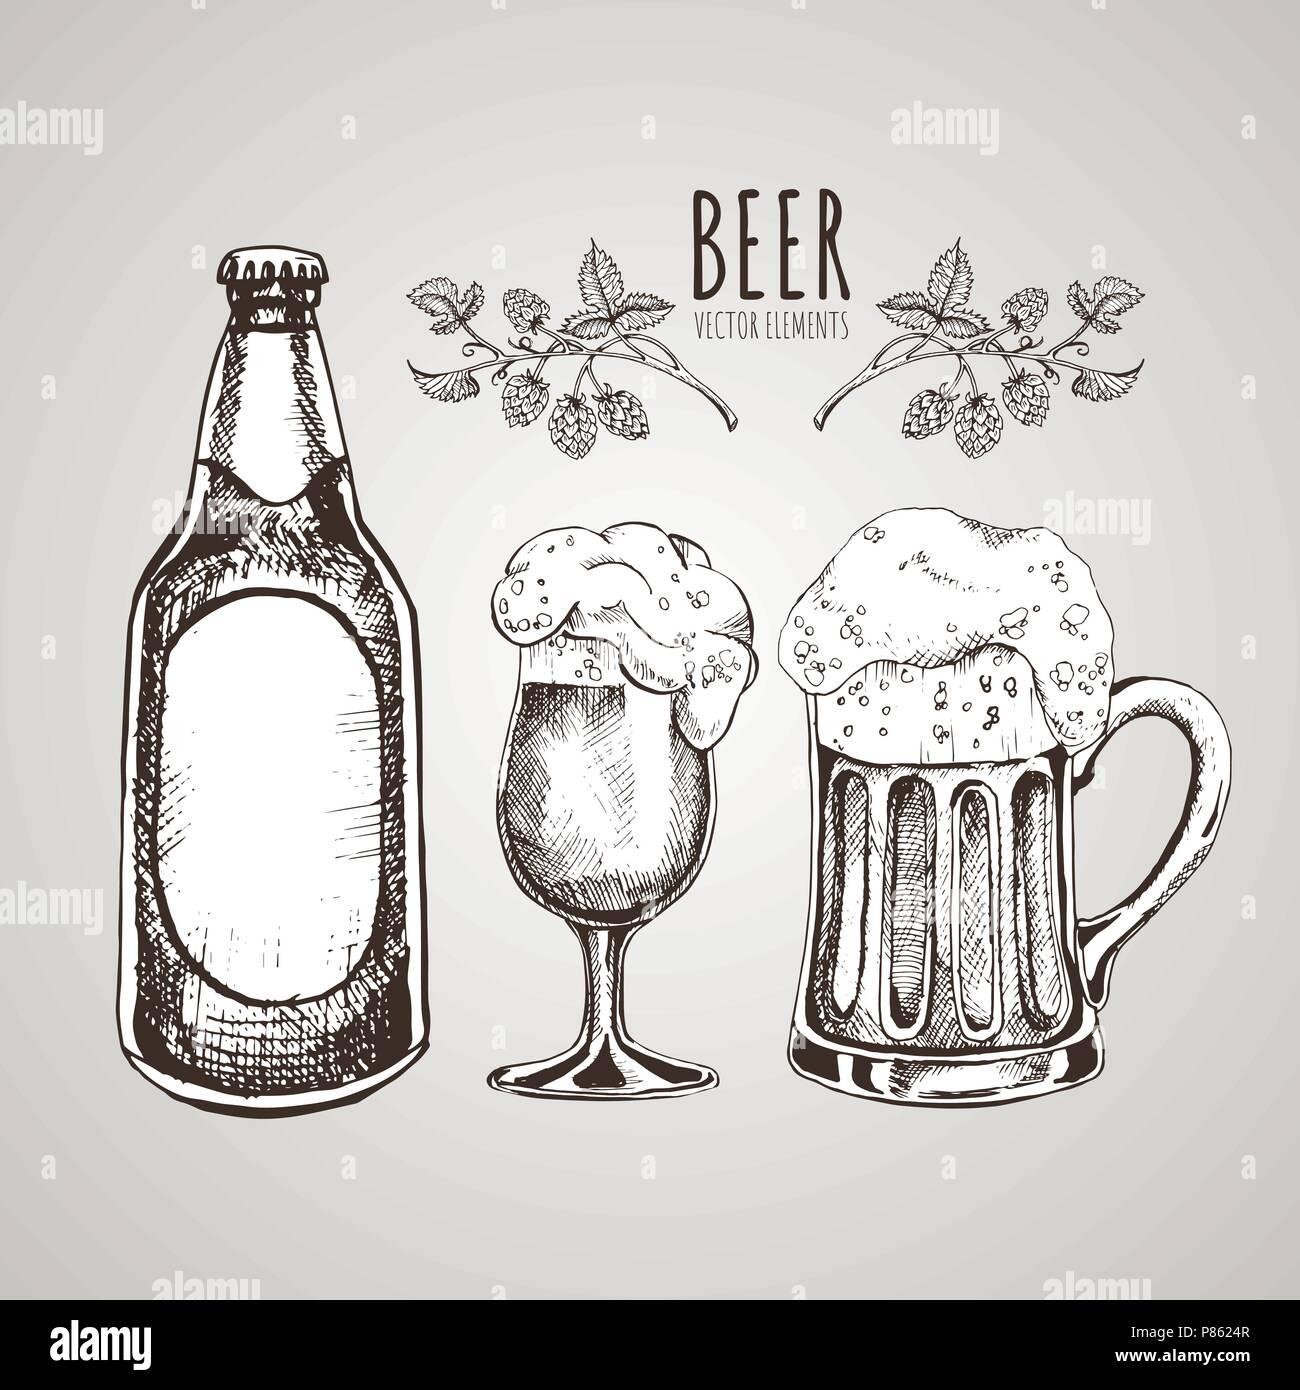 Vintage Beer Mug Illustration